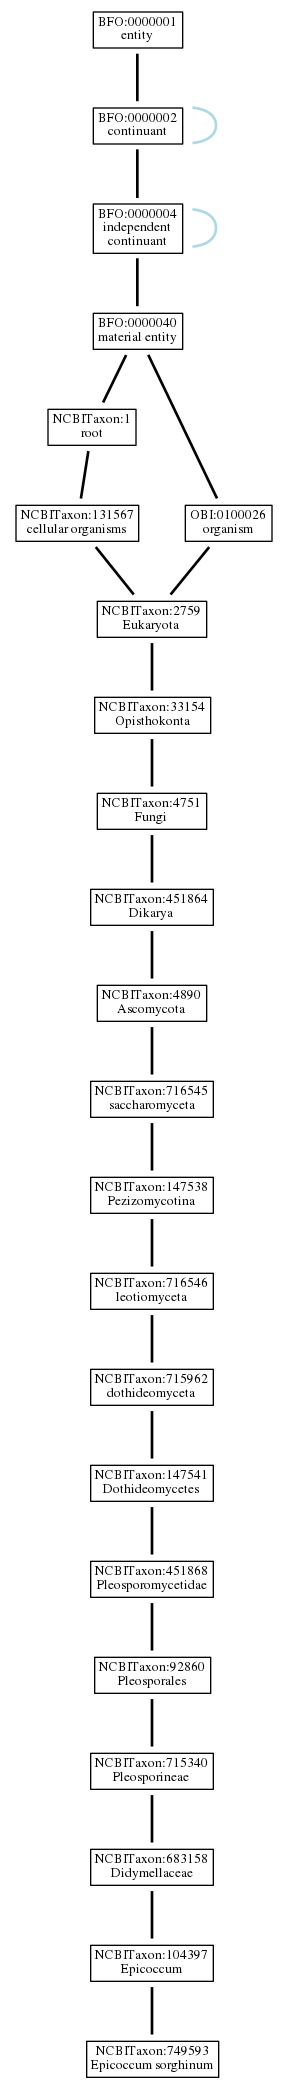 Graph of NCBITaxon:749593